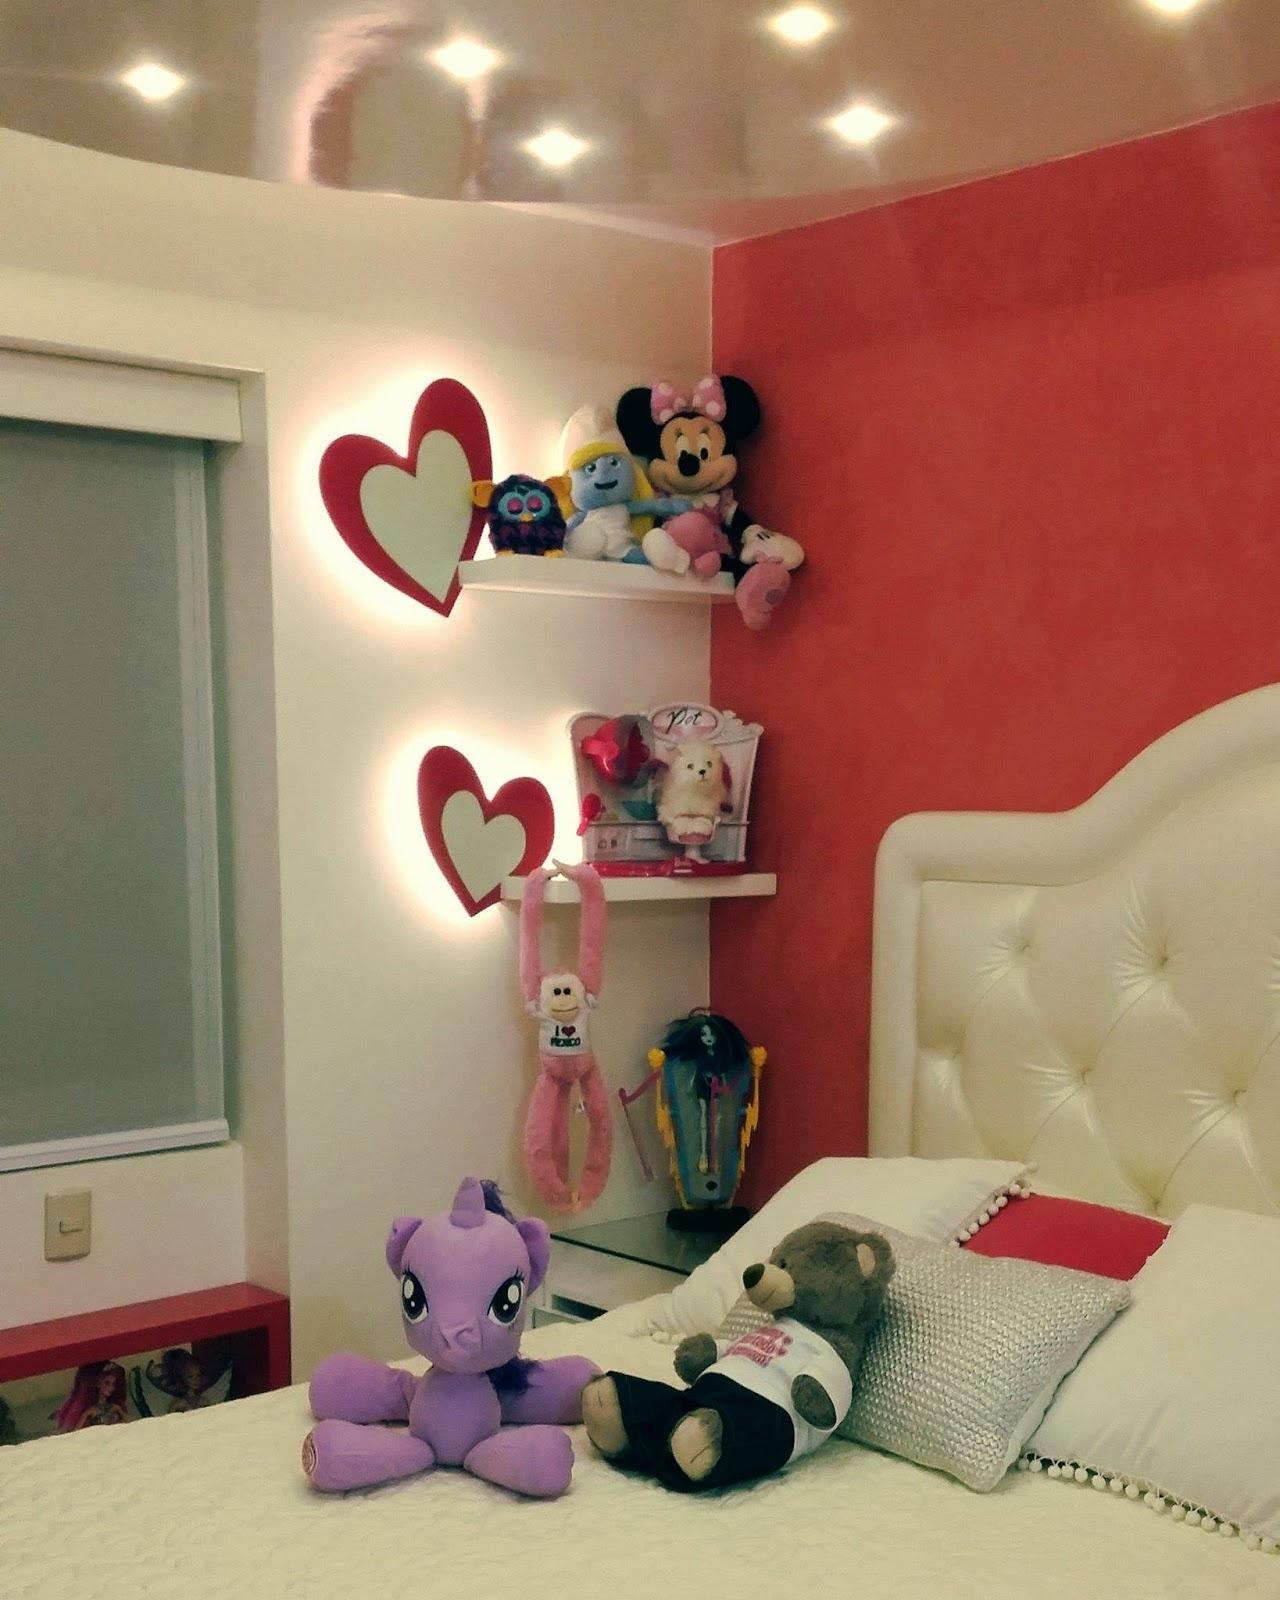 Enviar por correo electr nico escribe un blog compartir - Decoracion dormitorio nina ...